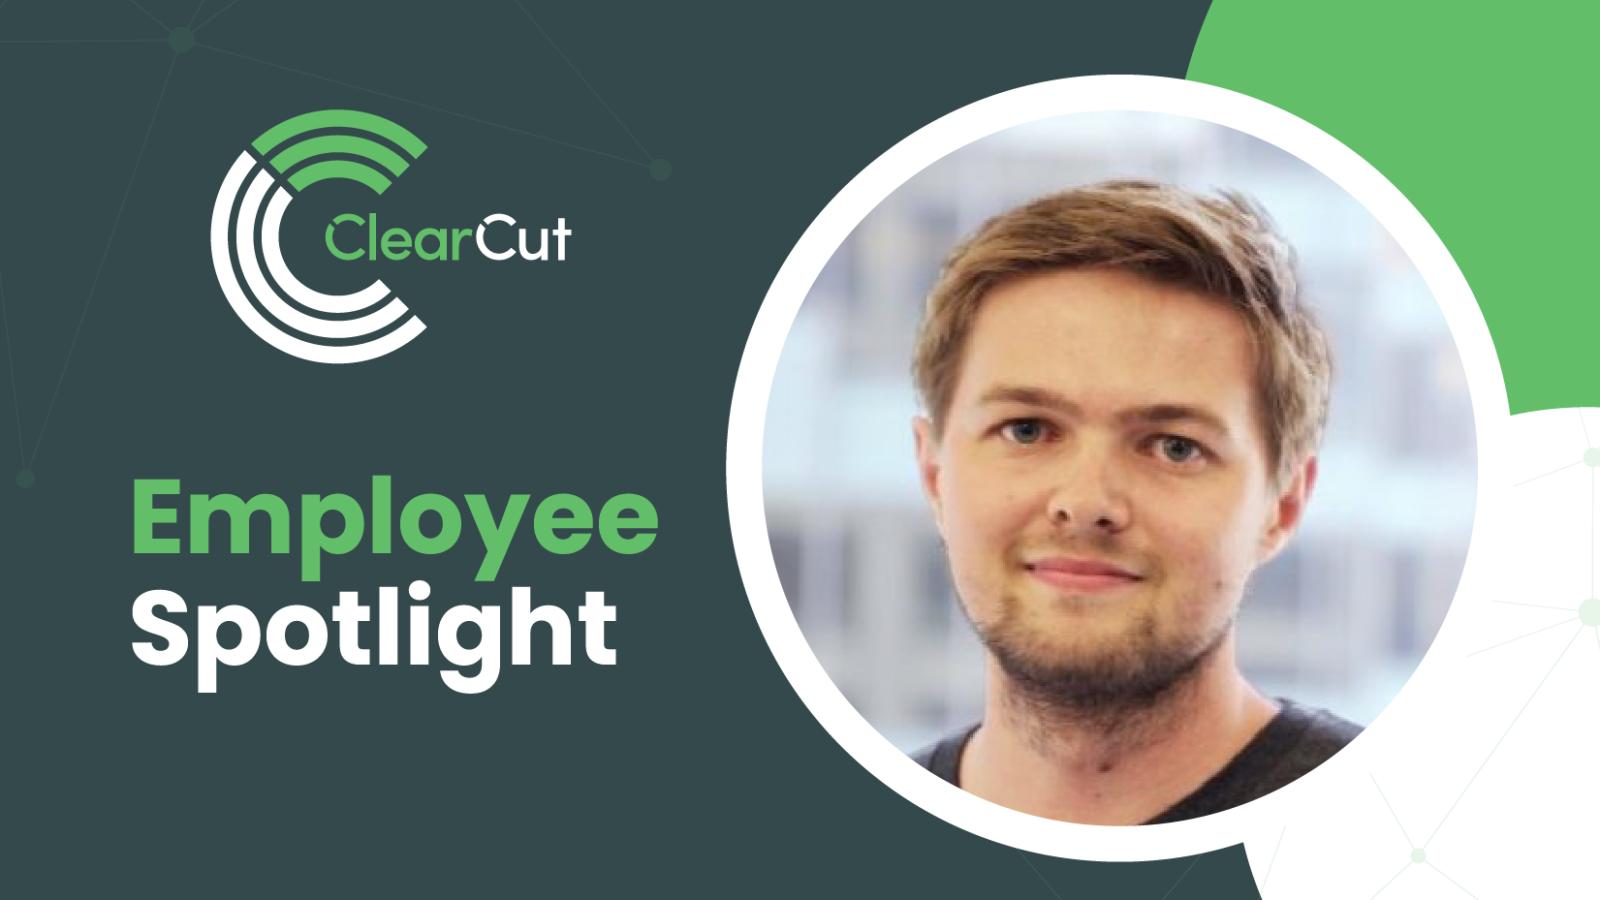 Meet Joel: ClearCut's Data Scientist